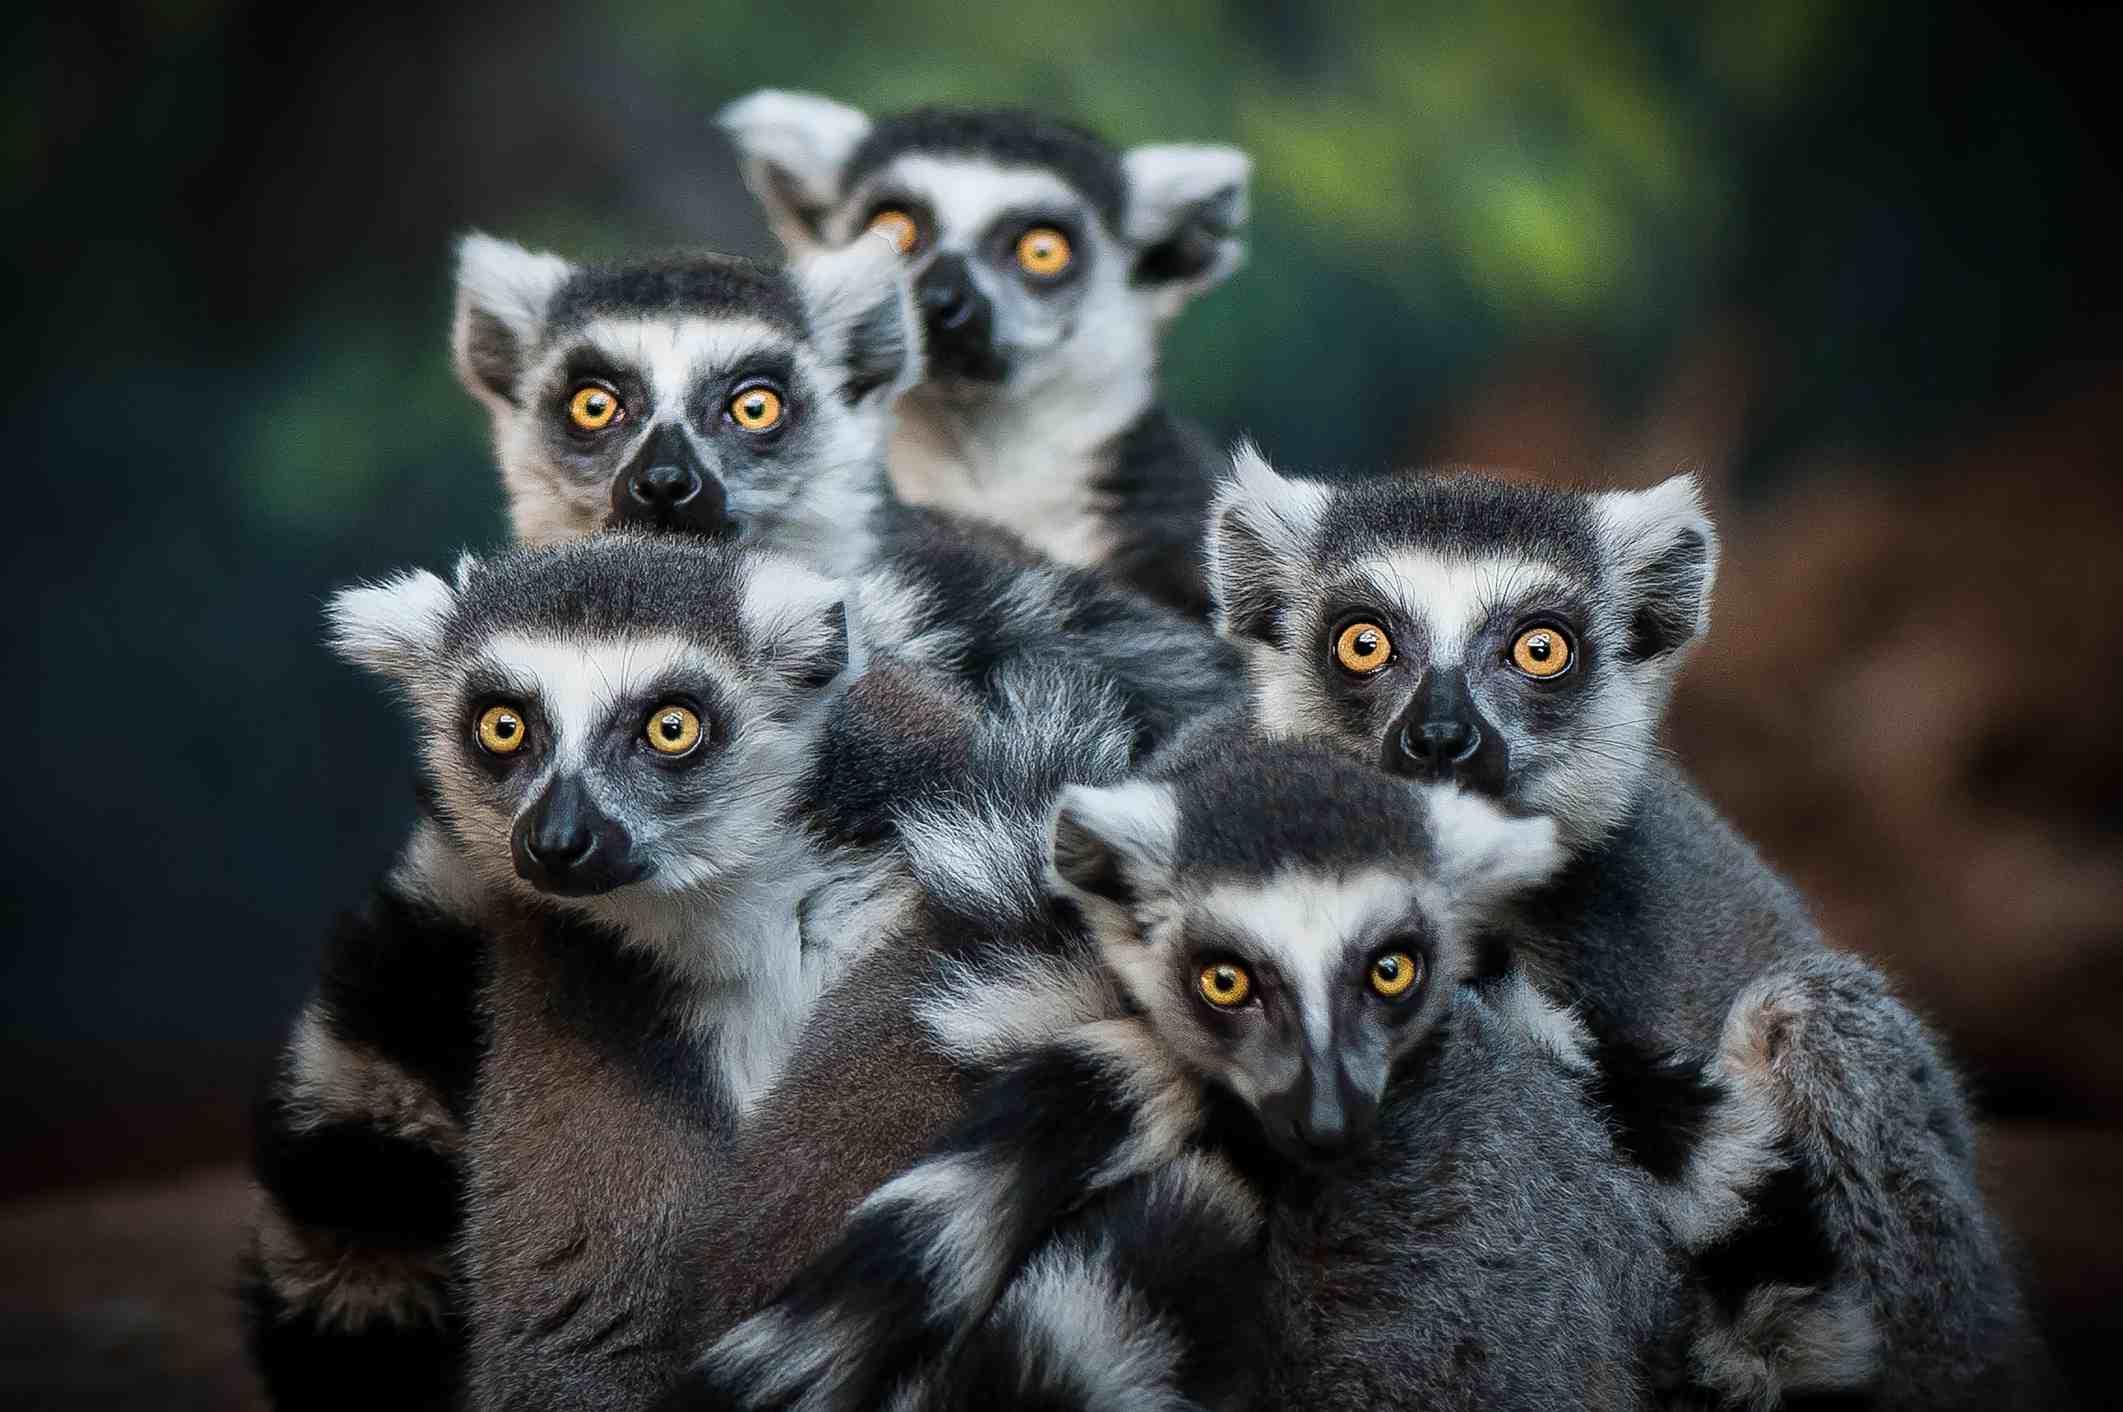 A pack of Lemurs